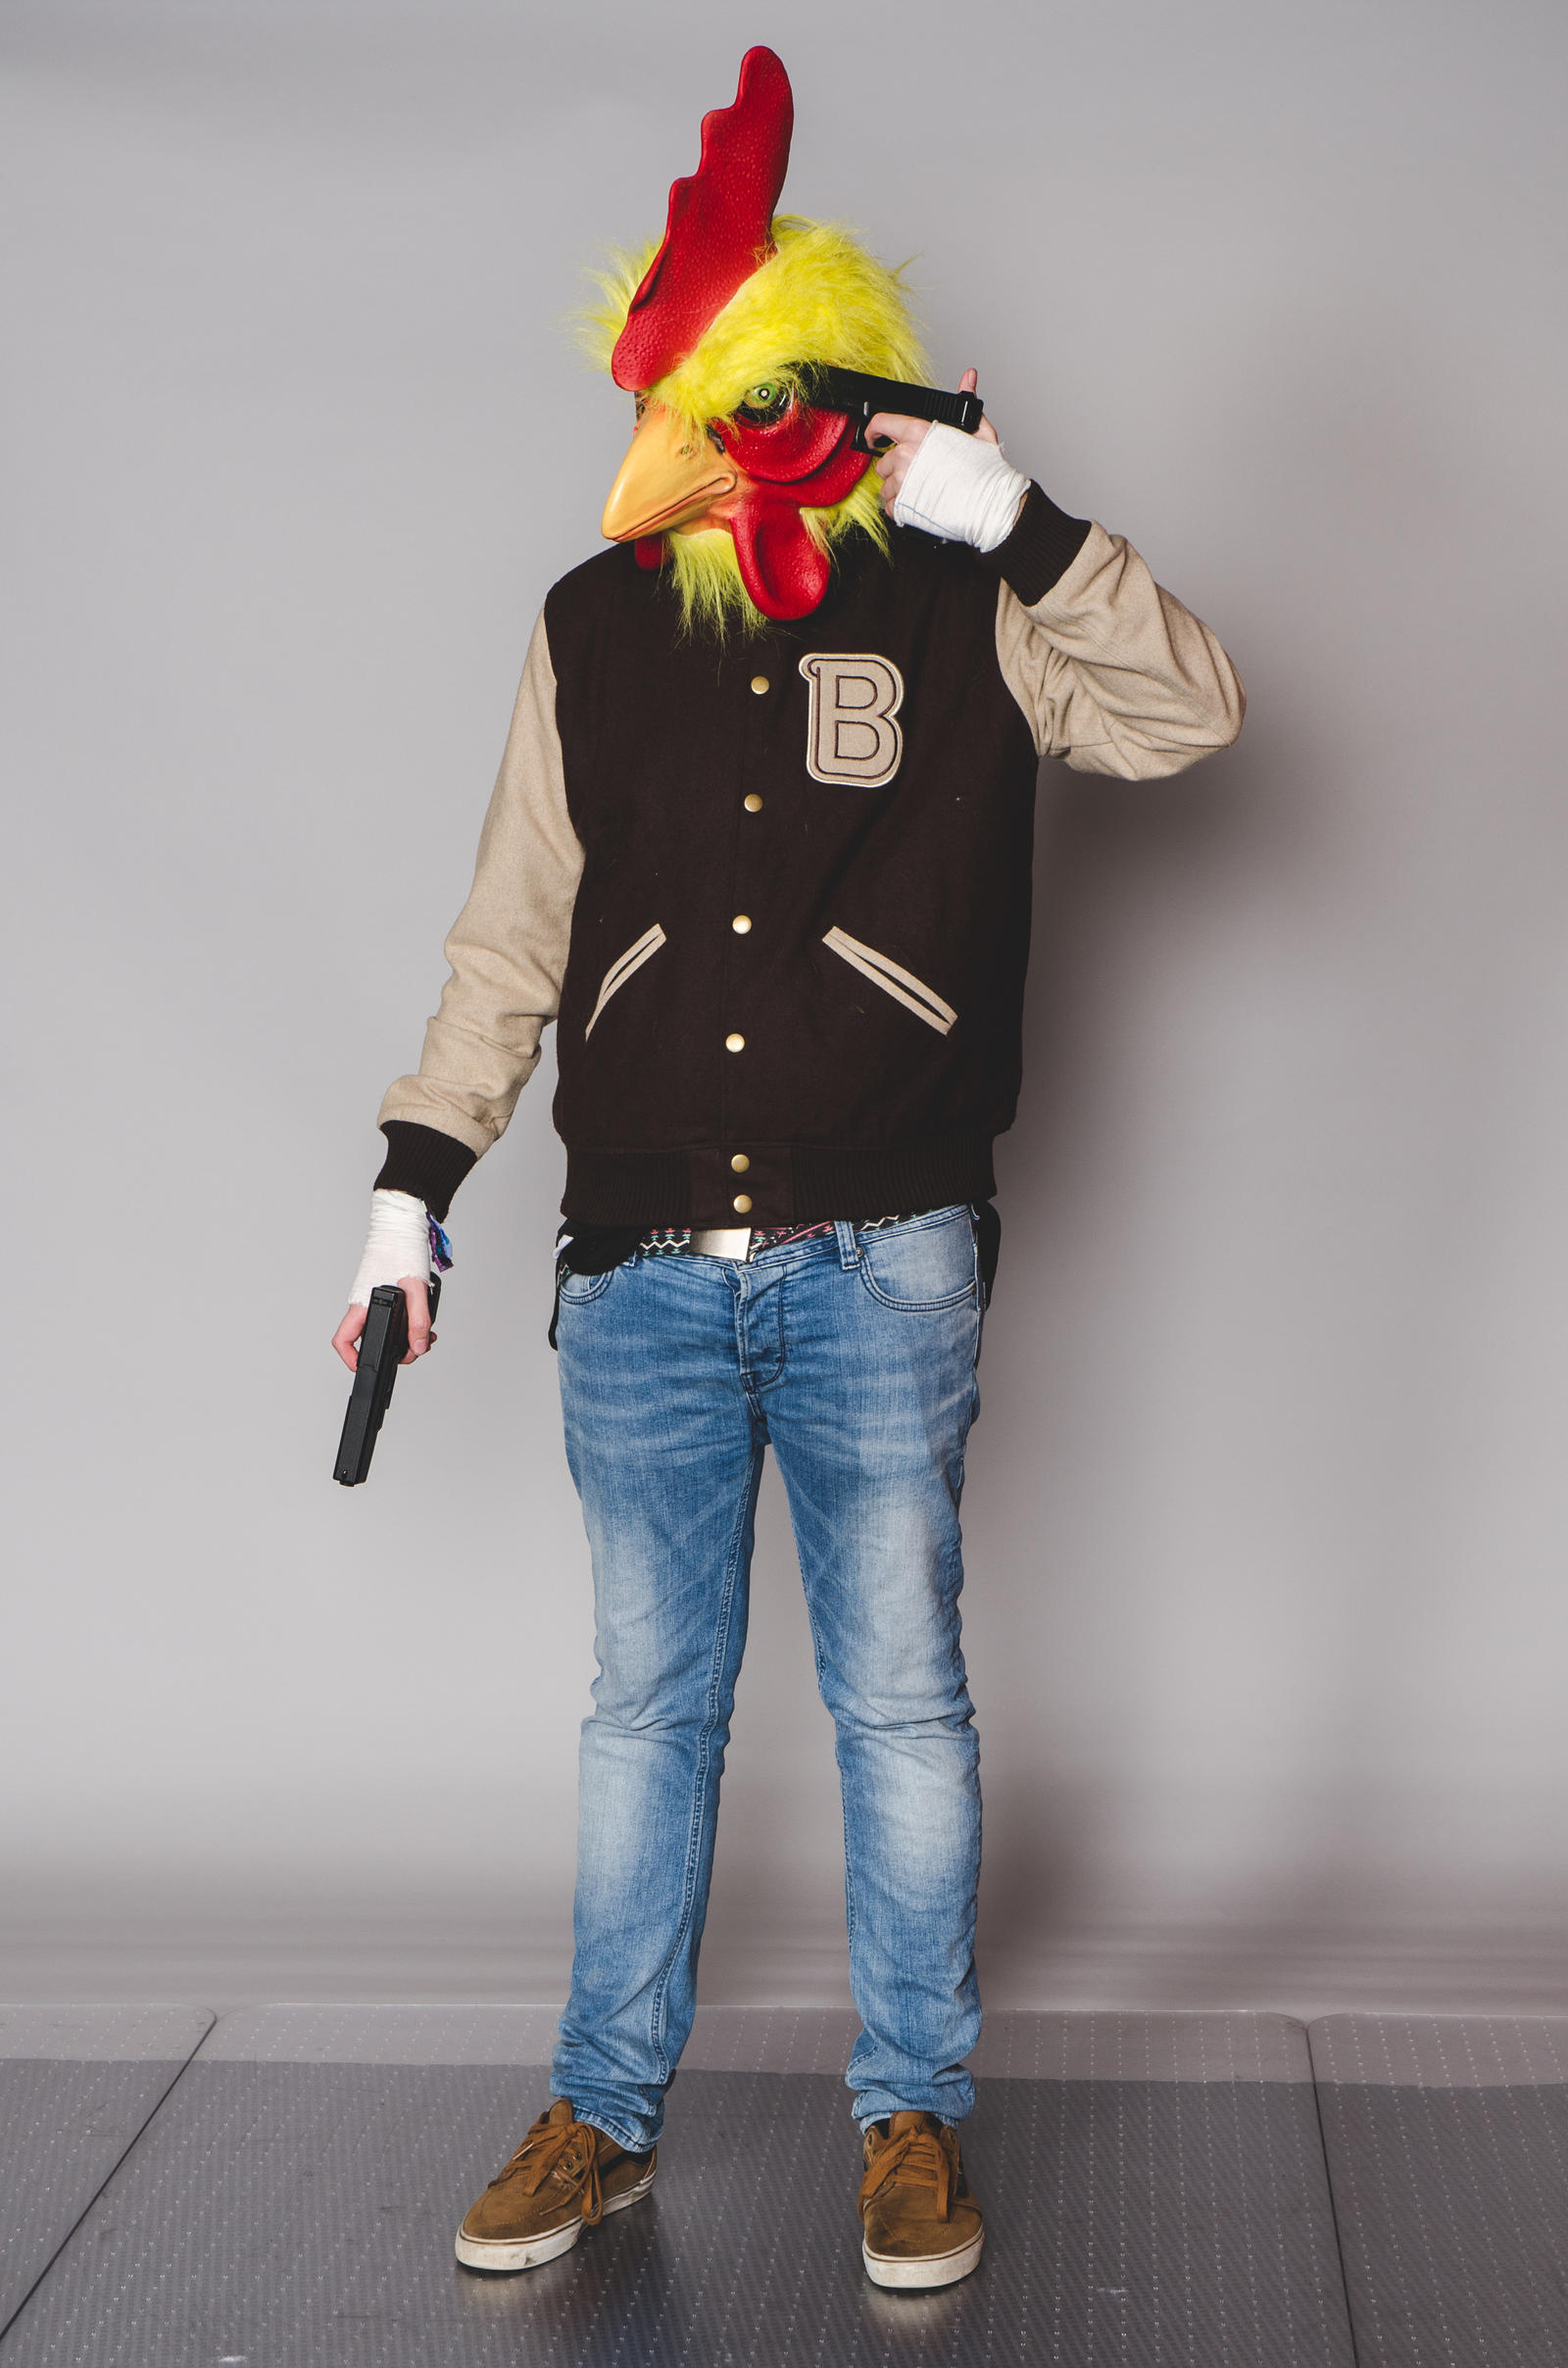 Hotline miami jacket figure buy